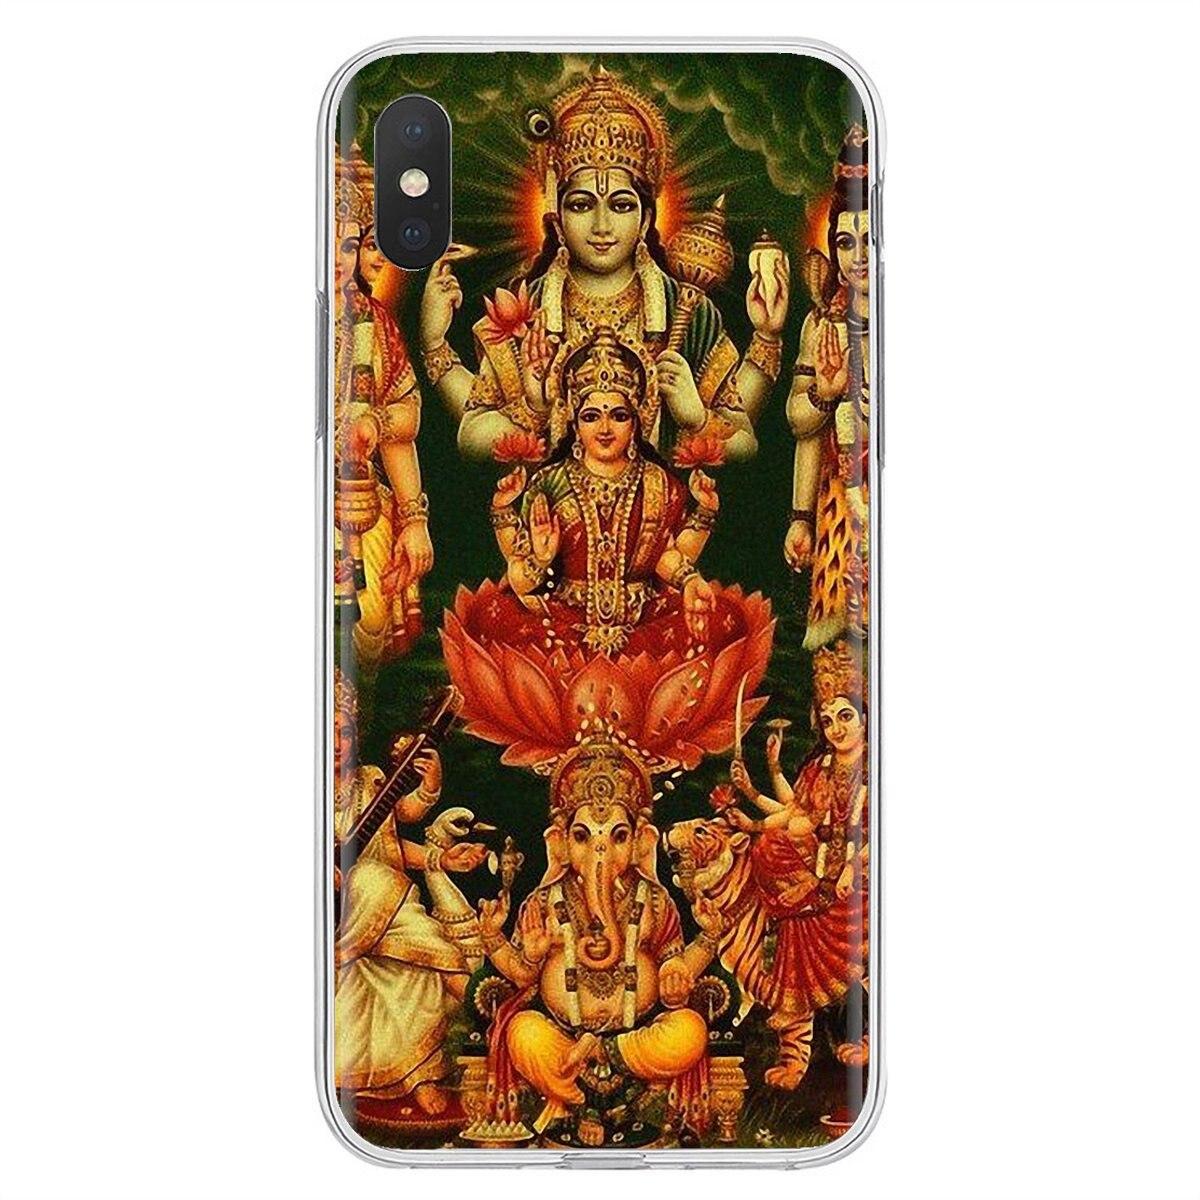 India hindú Dios shiva Riding Nandi funda de silicona para Samsung Galaxy J1 J2 J3 J4 J5 J6 J7 J8 Plus 2018 Prime 2015 2016 2017